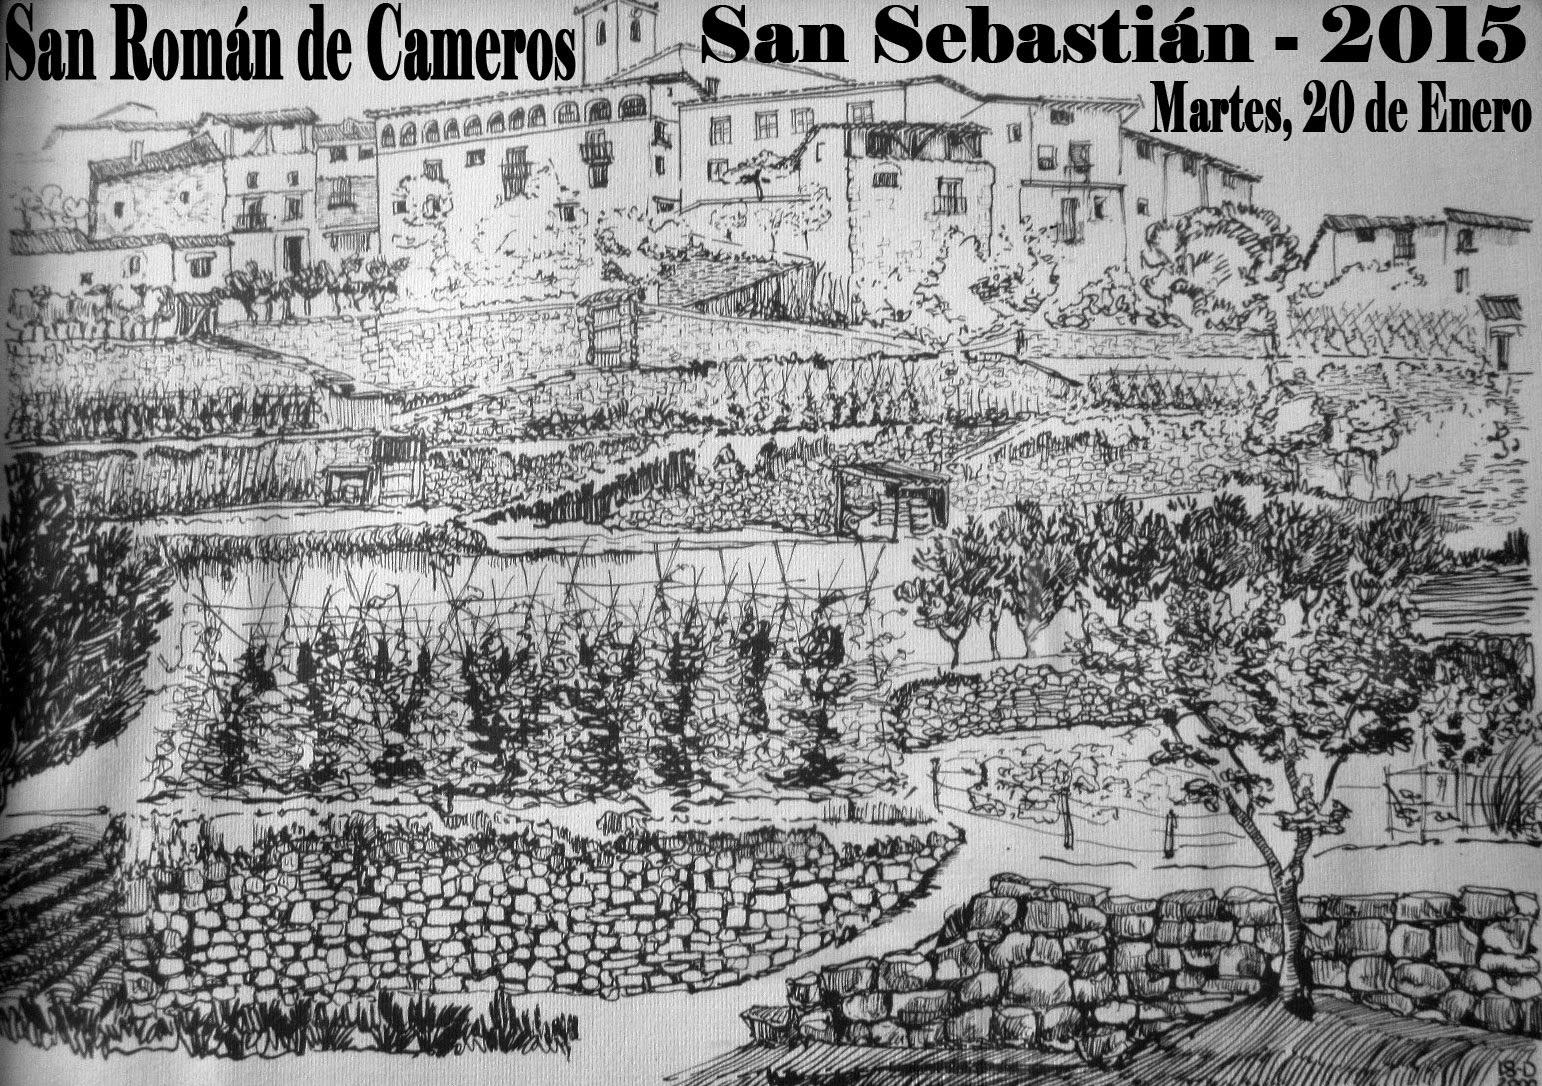 San Román de Cameros. San Sebastián 2015.